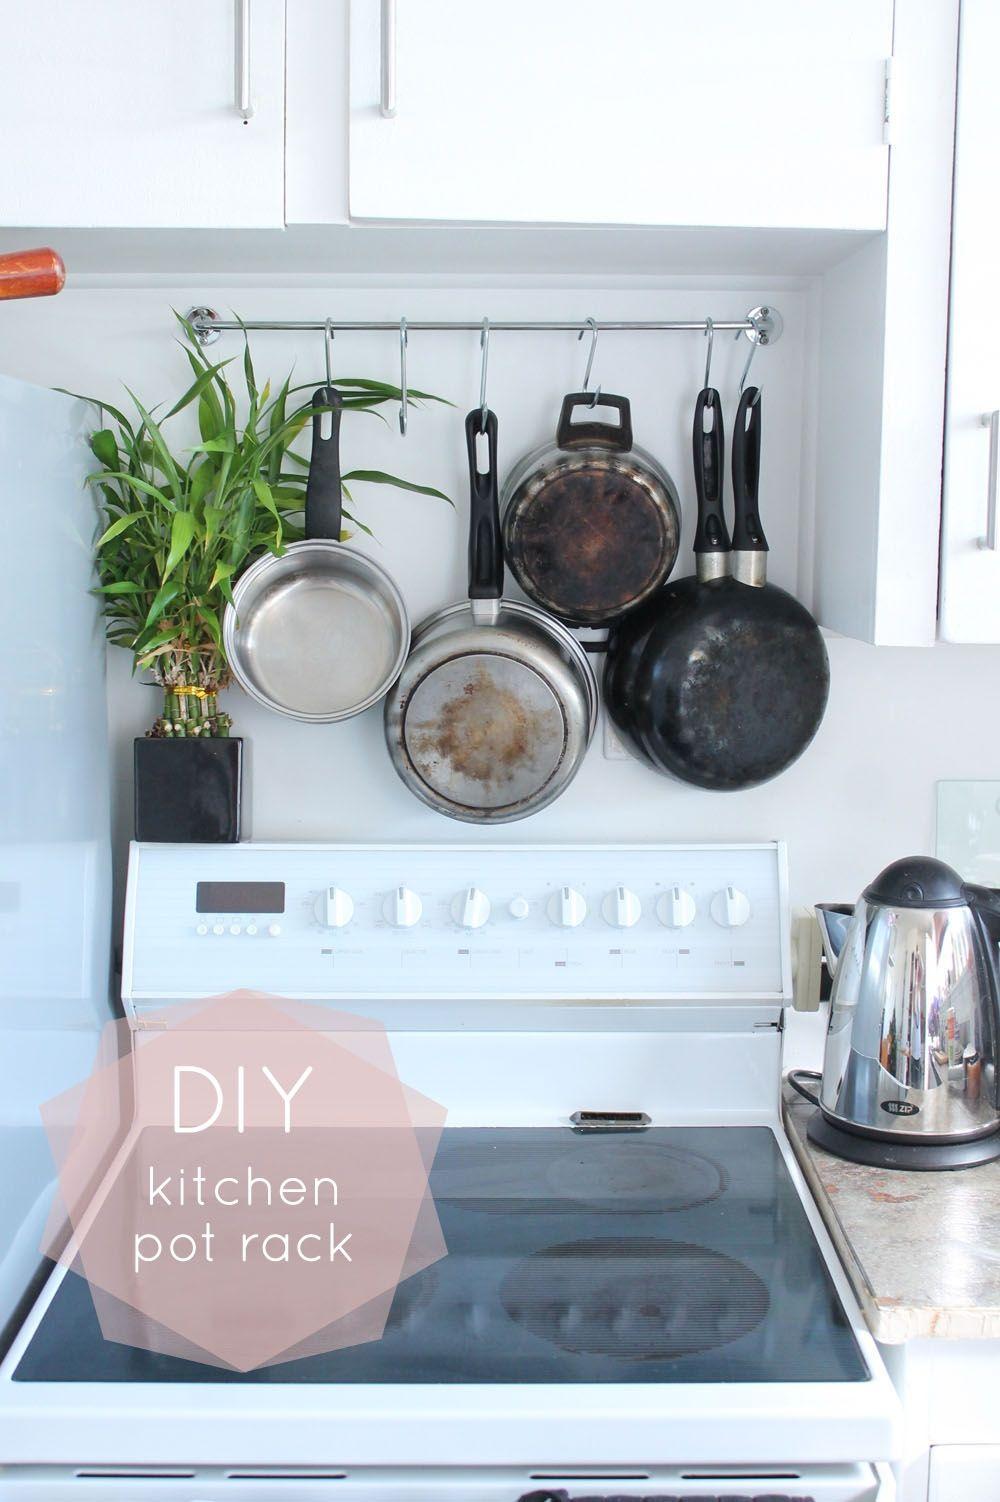 diy hanging pot rack tutorial reno and deco diy kitchen pot rack kitchen decor. Black Bedroom Furniture Sets. Home Design Ideas